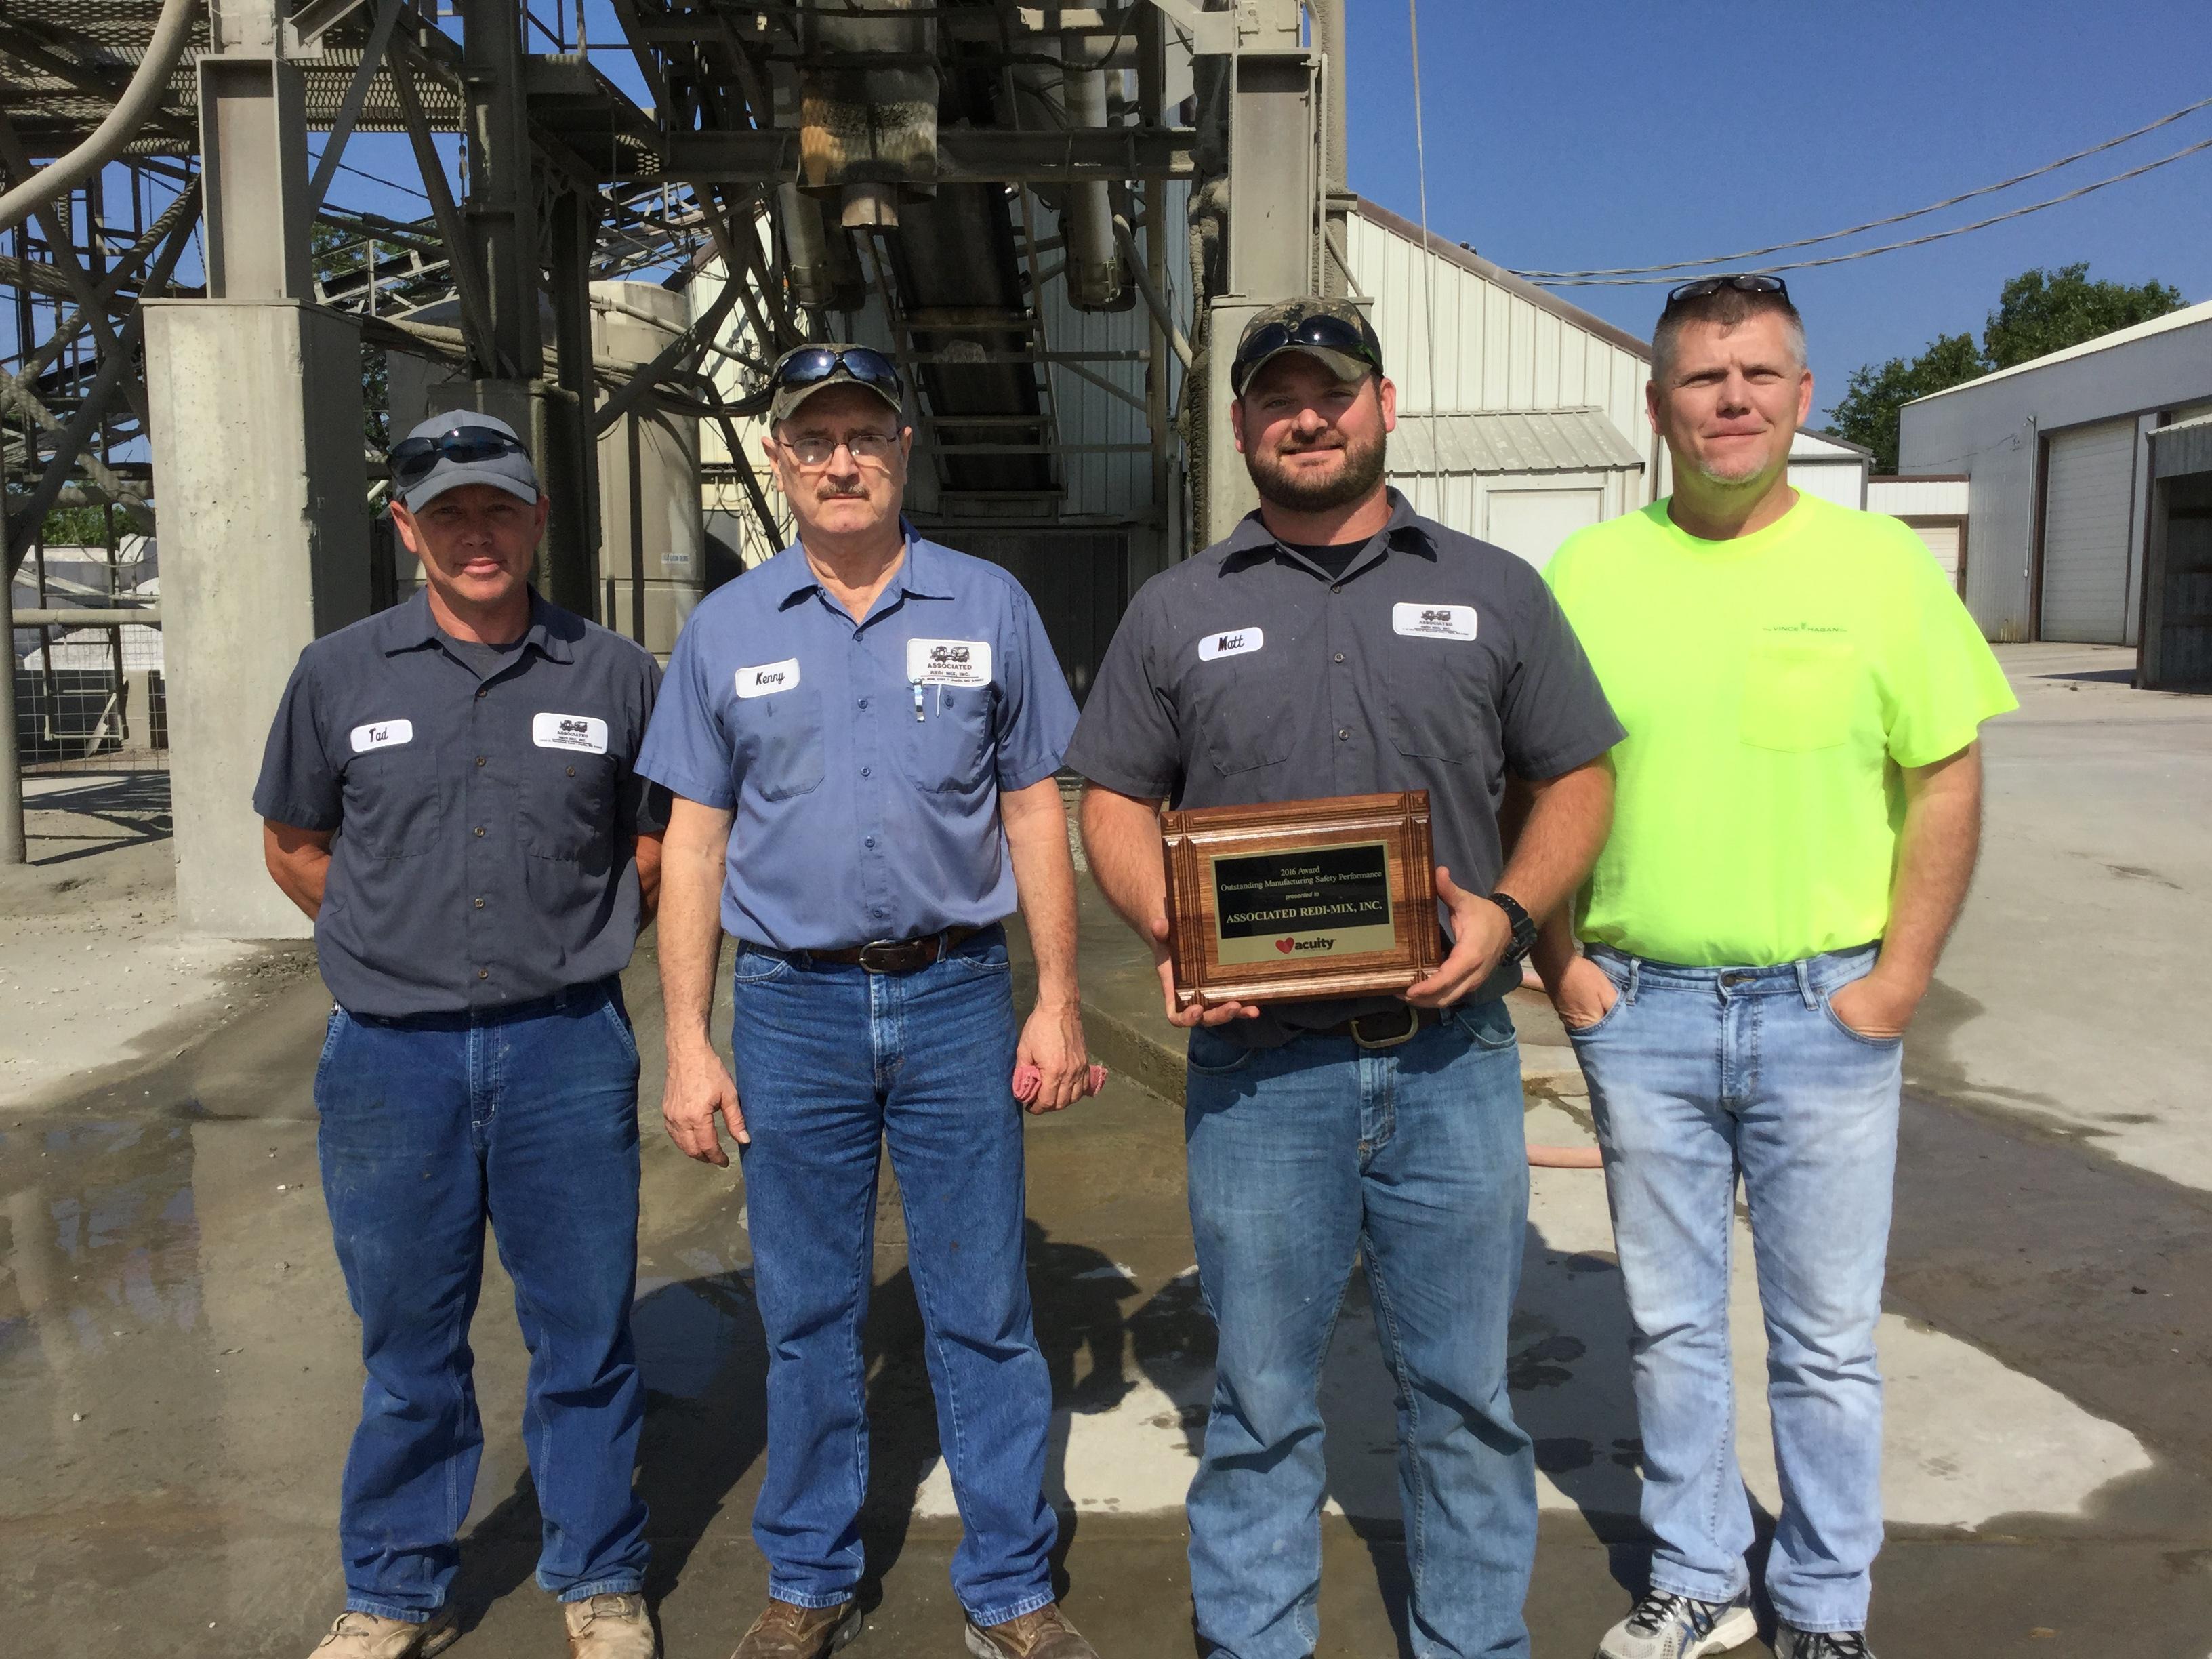 2017 Acuity Safety Award